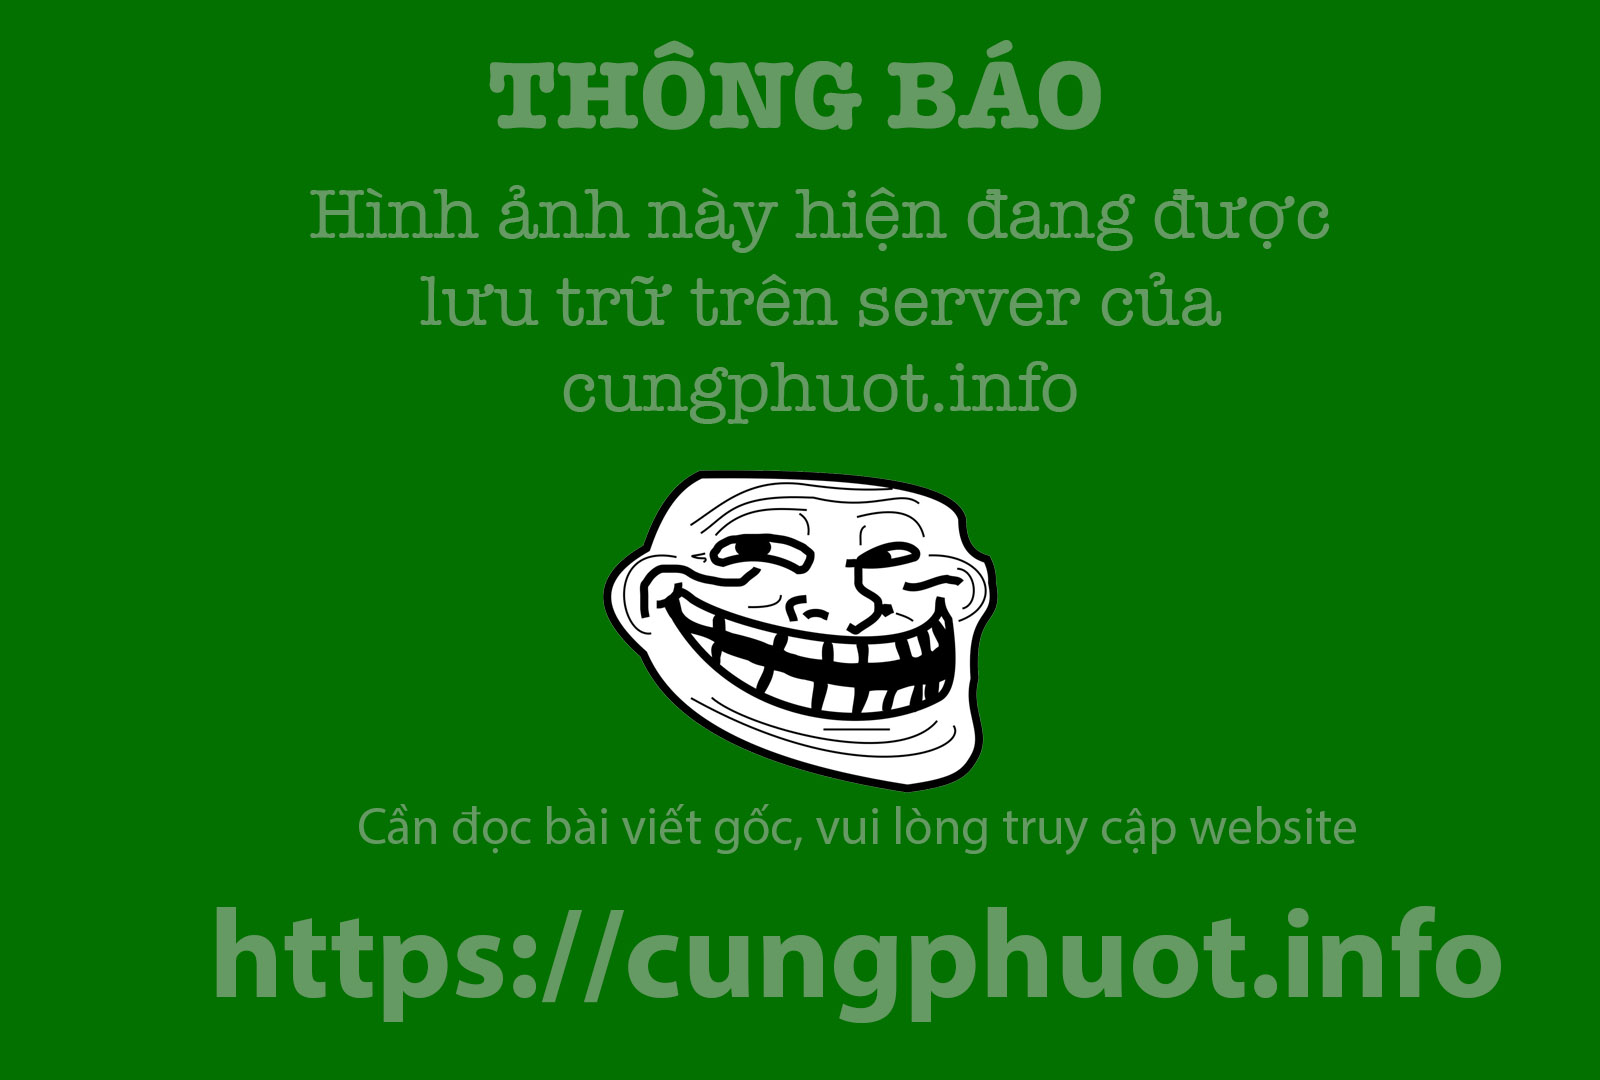 Binh minh tuyet dep tren nhung doi che Tan Cuong hinh anh 11